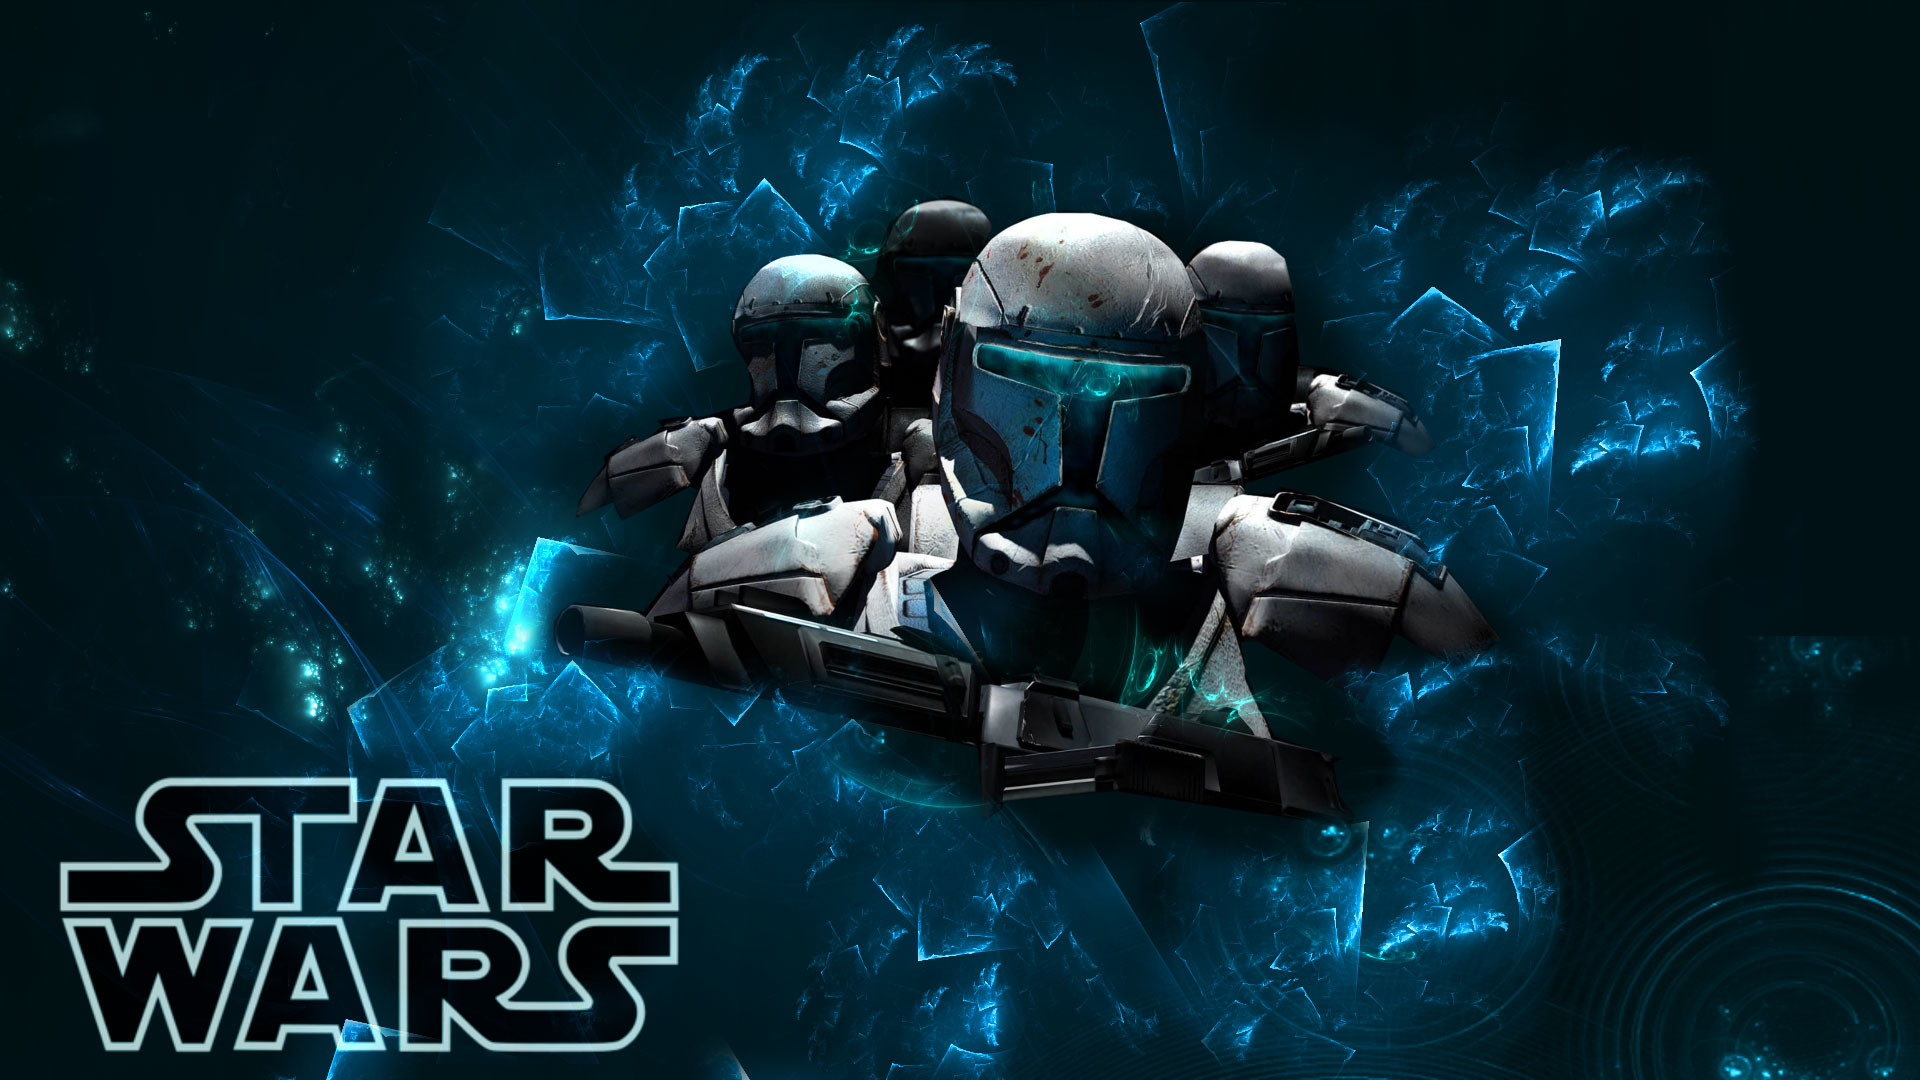 Stormtrooper Star Wars Wallpaper (6)